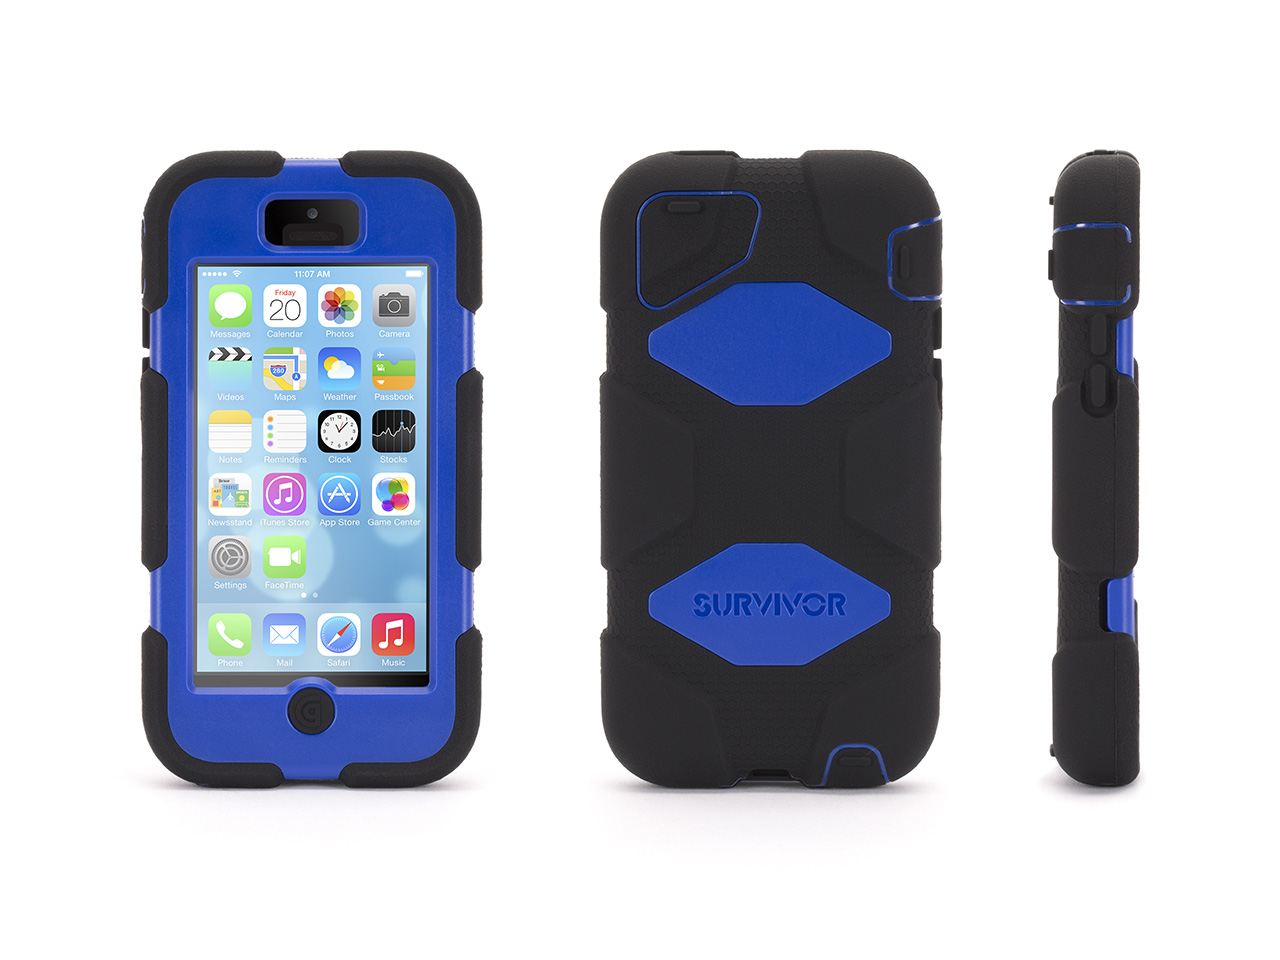 Stitch Iphone 5 Case Promotion-Shop for Promotional Stitch